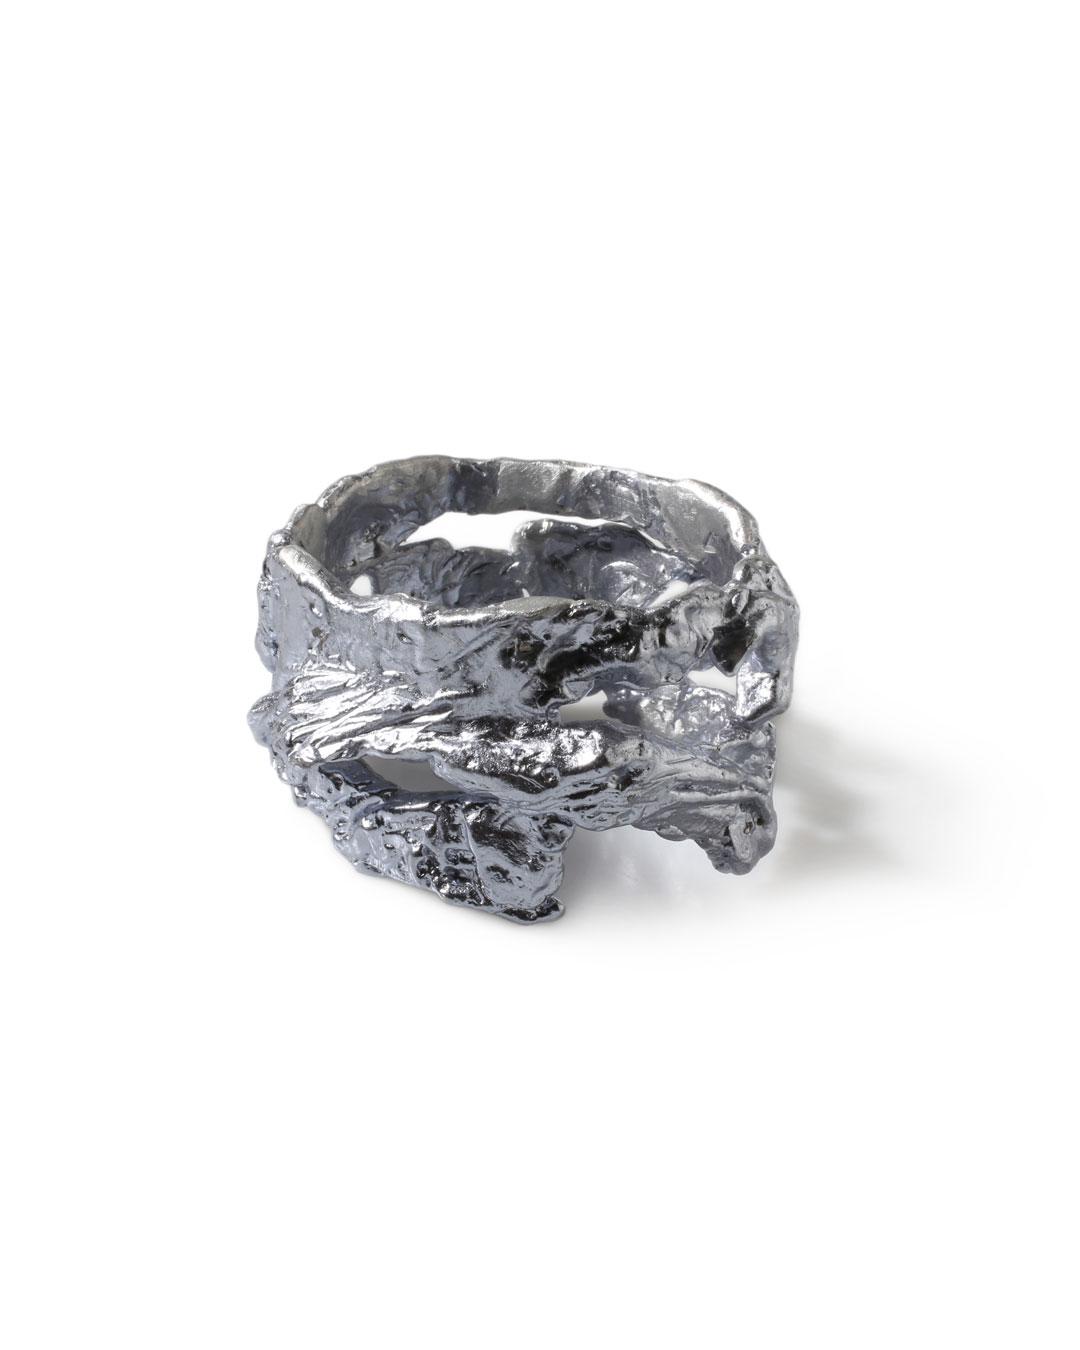 Juliane Brandes, zonder titel, 2013, armband; aluminium-mangaan, 85 x 50 mm, €1100